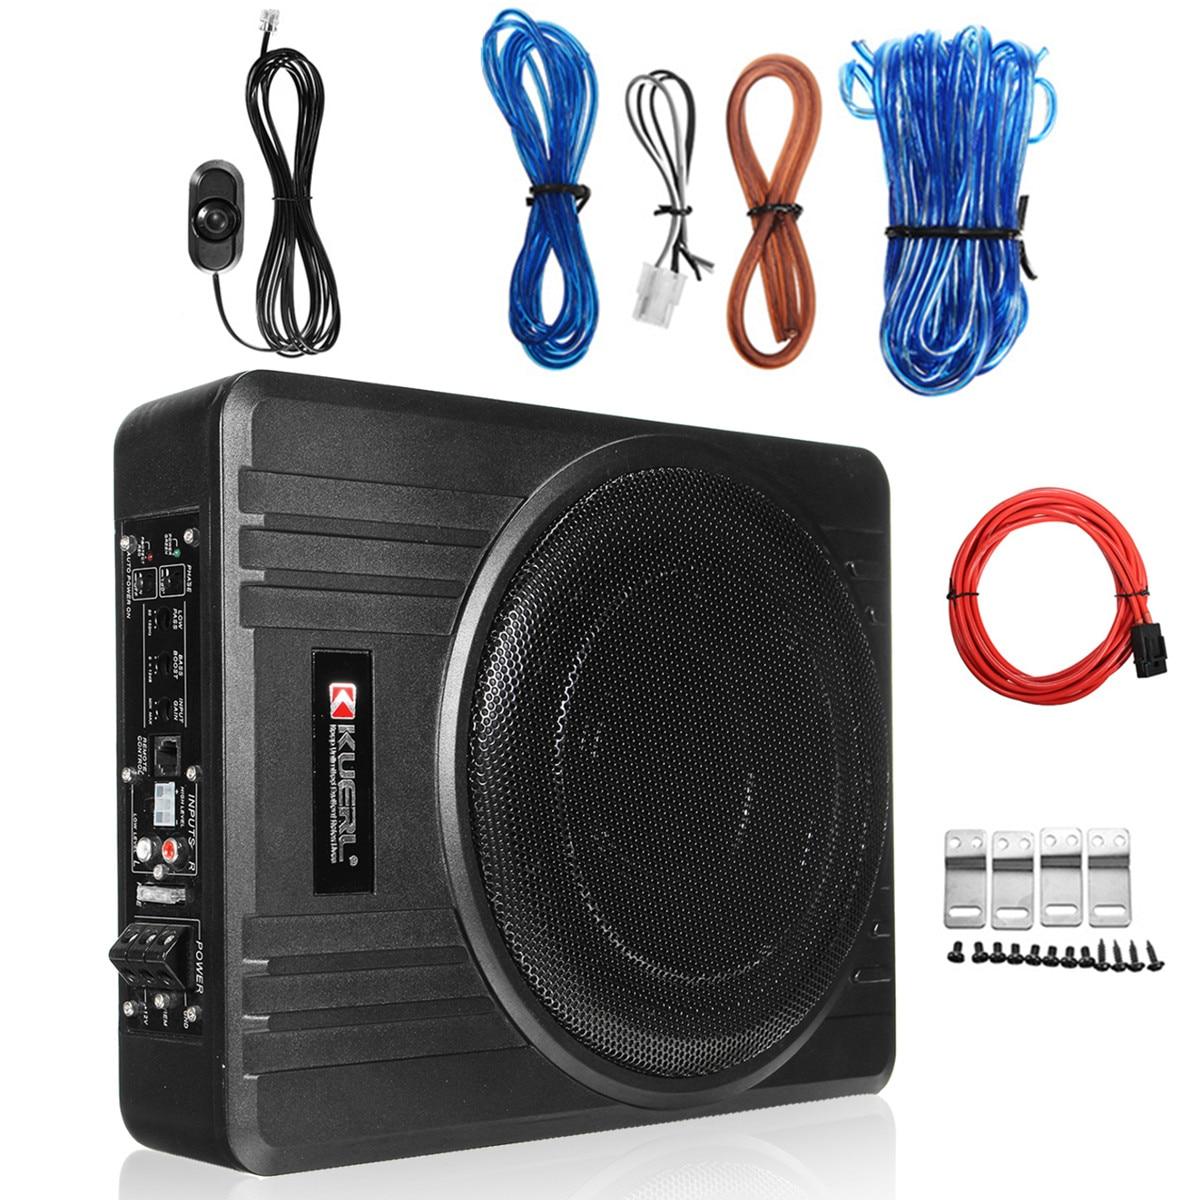 Bass-Speaker Subwoofer Car-Amplifier Under-Seat Slim 10inch 600W